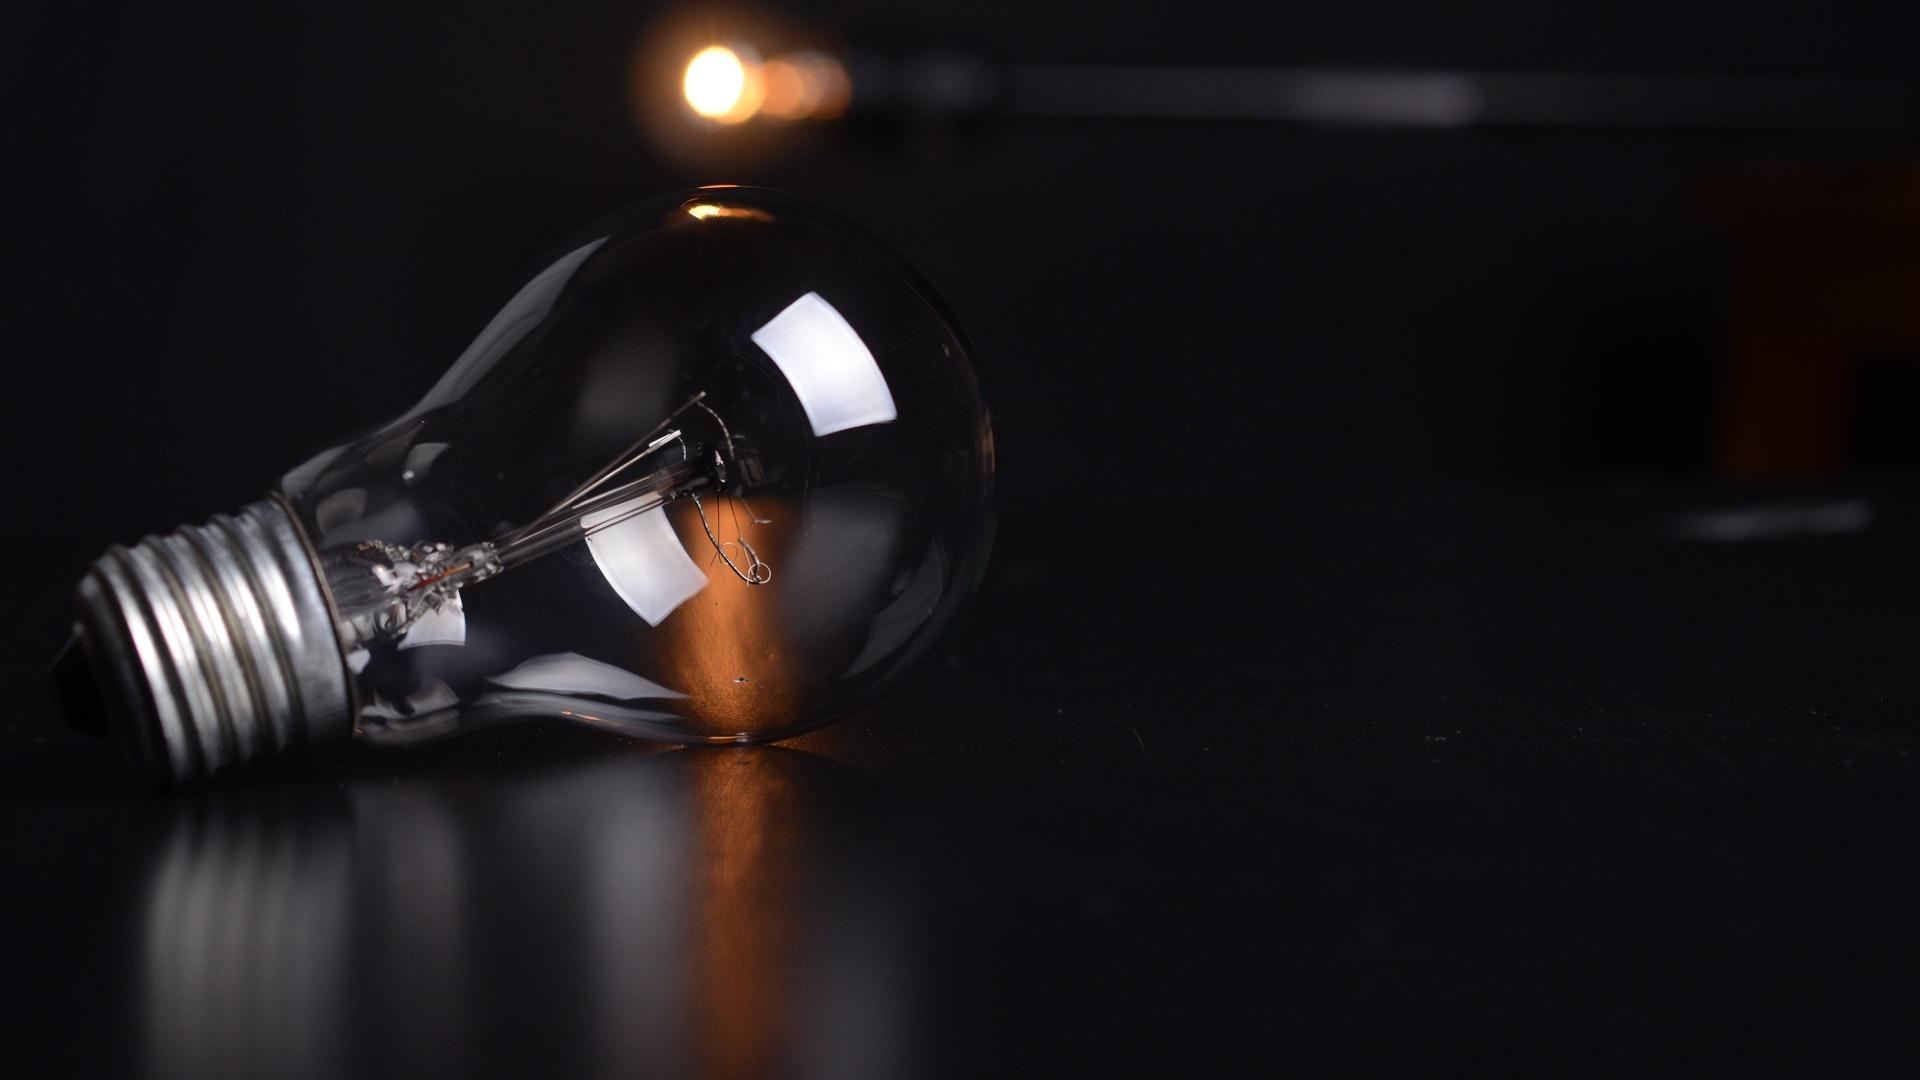 New bulb that work on solar energy